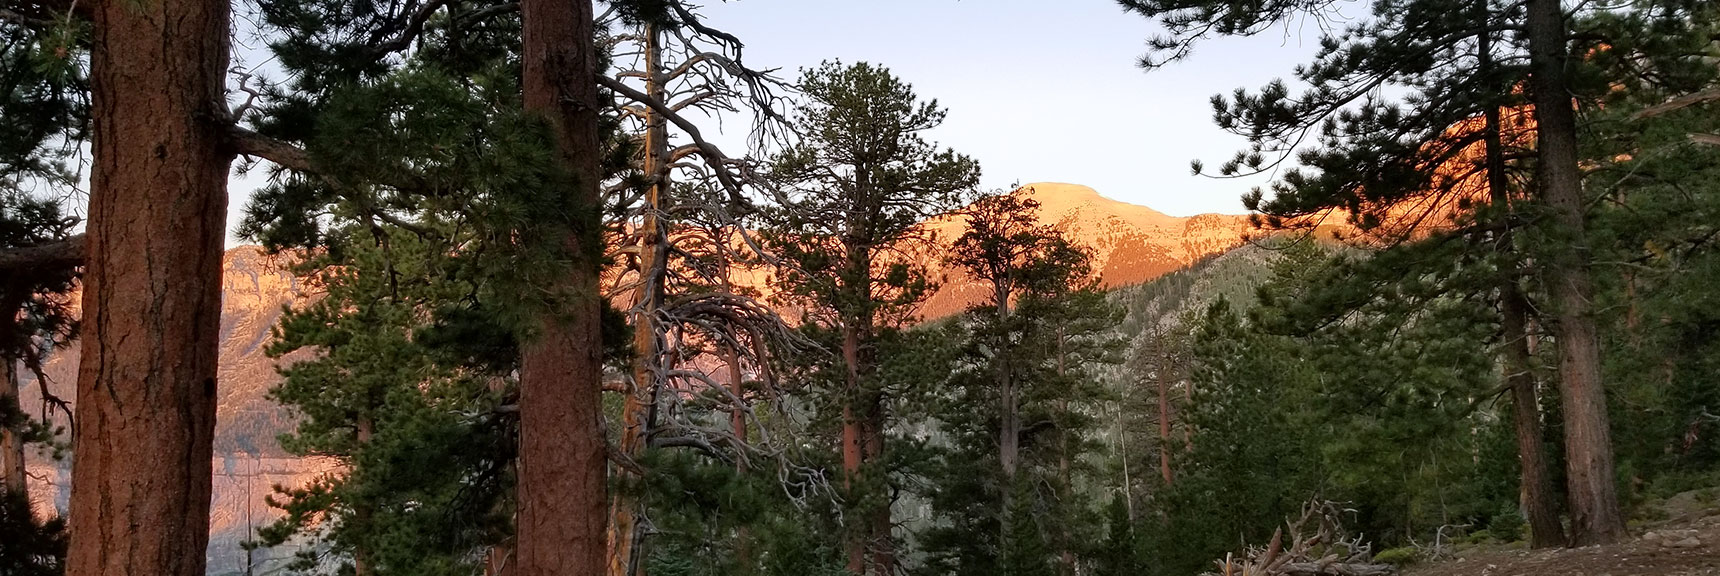 Charleston Peak Viewed from Trail Canyon at Sunrise, Nevada